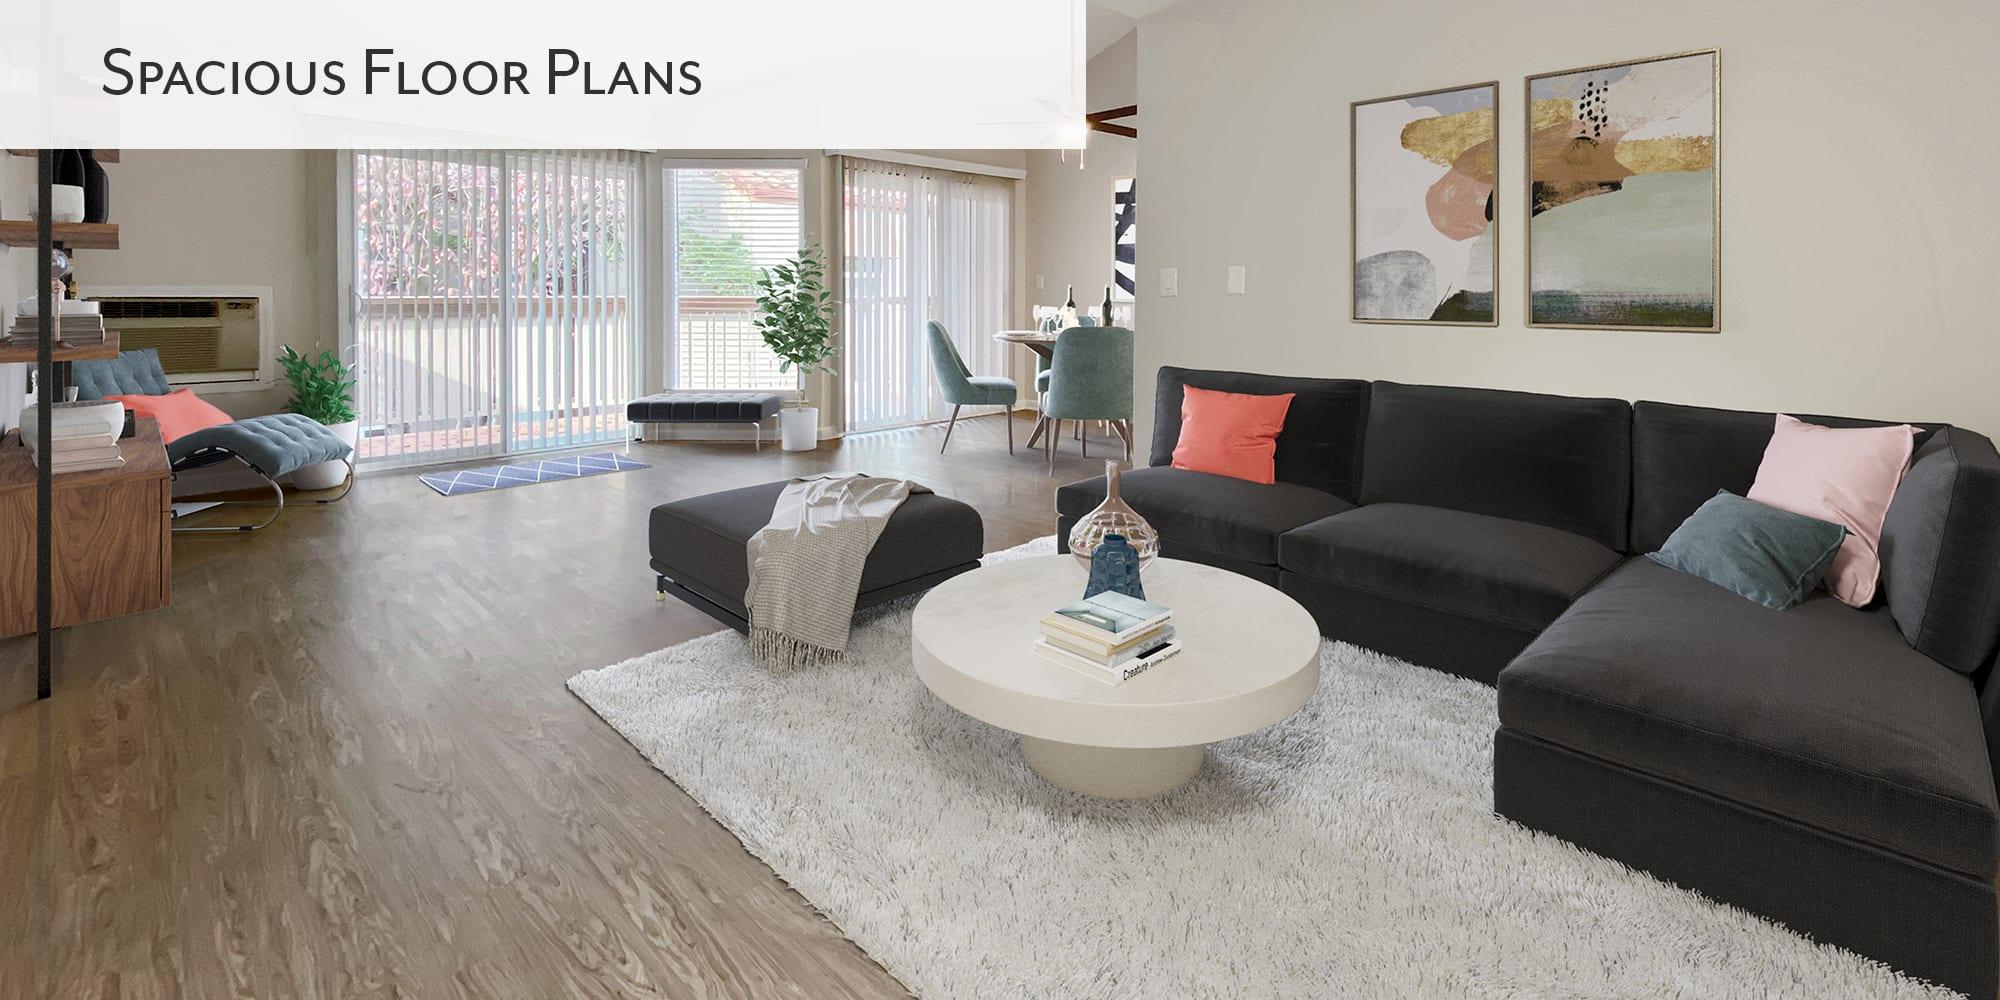 Spacious floor plans at Valley Plaza Villages in Pleasanton, California